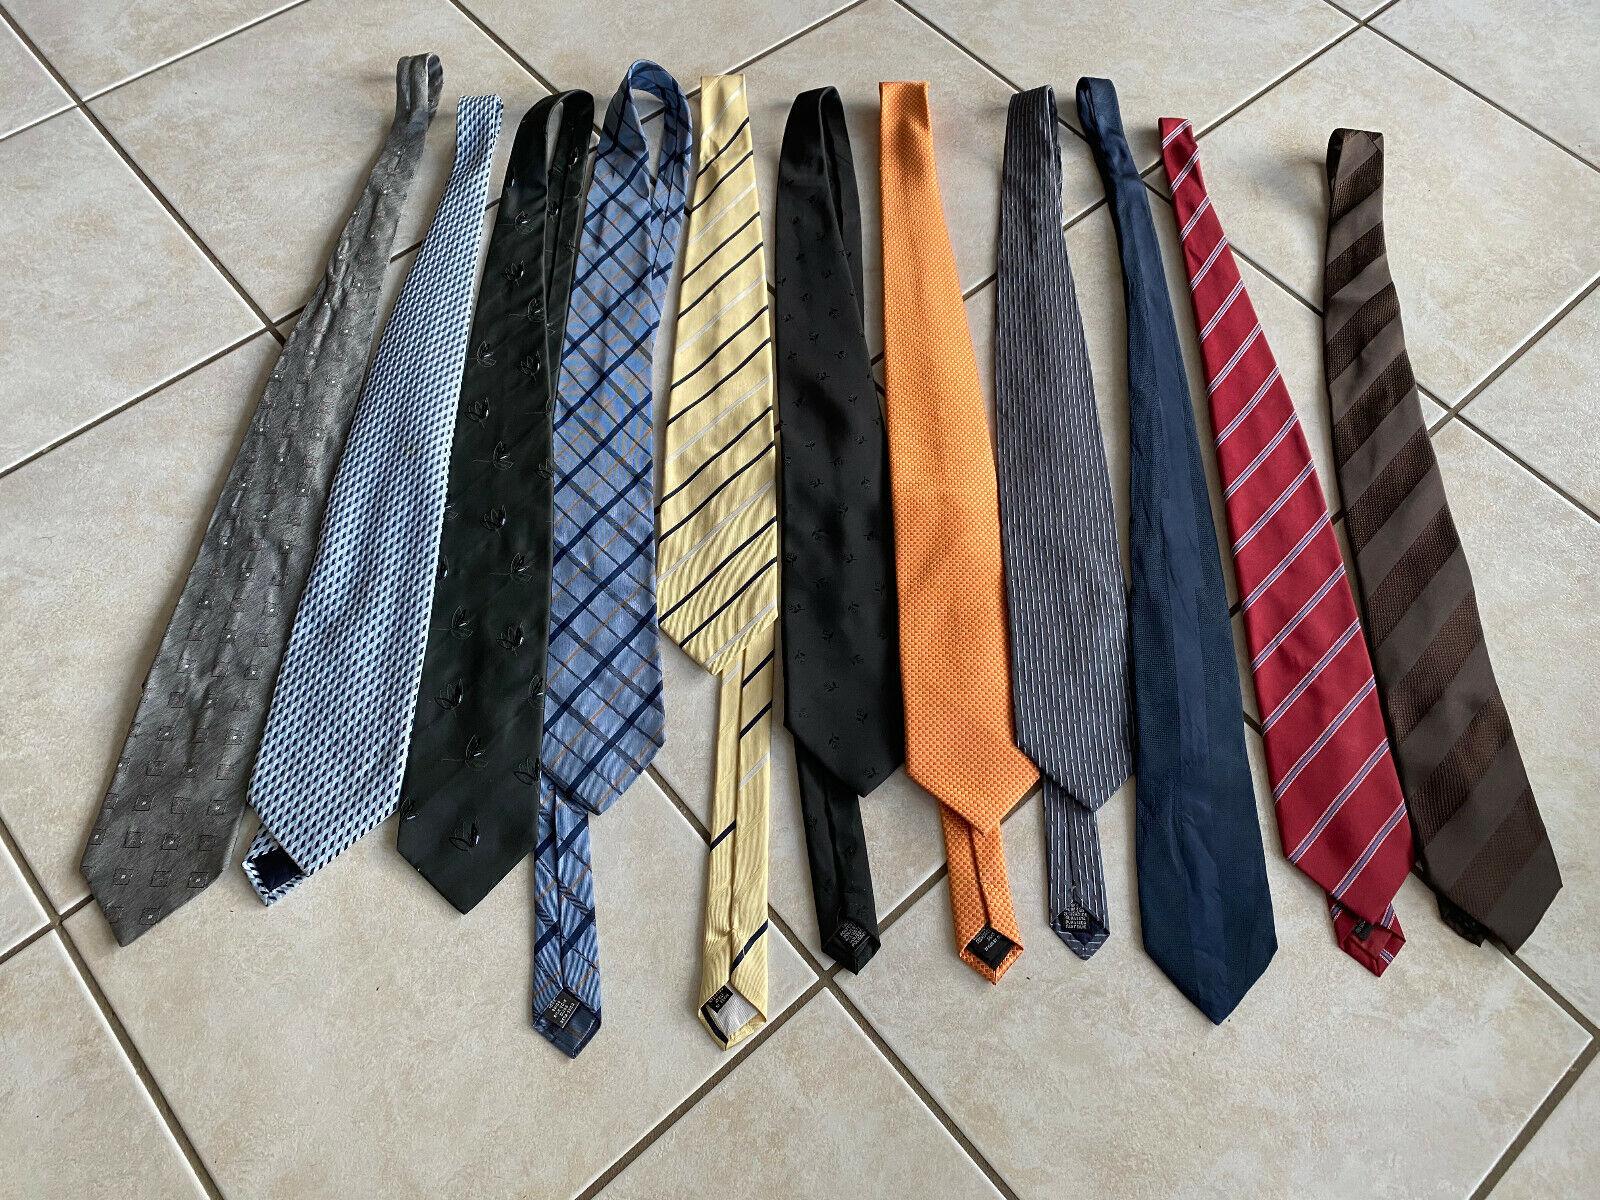 11 Krawatten verschiedene Farben